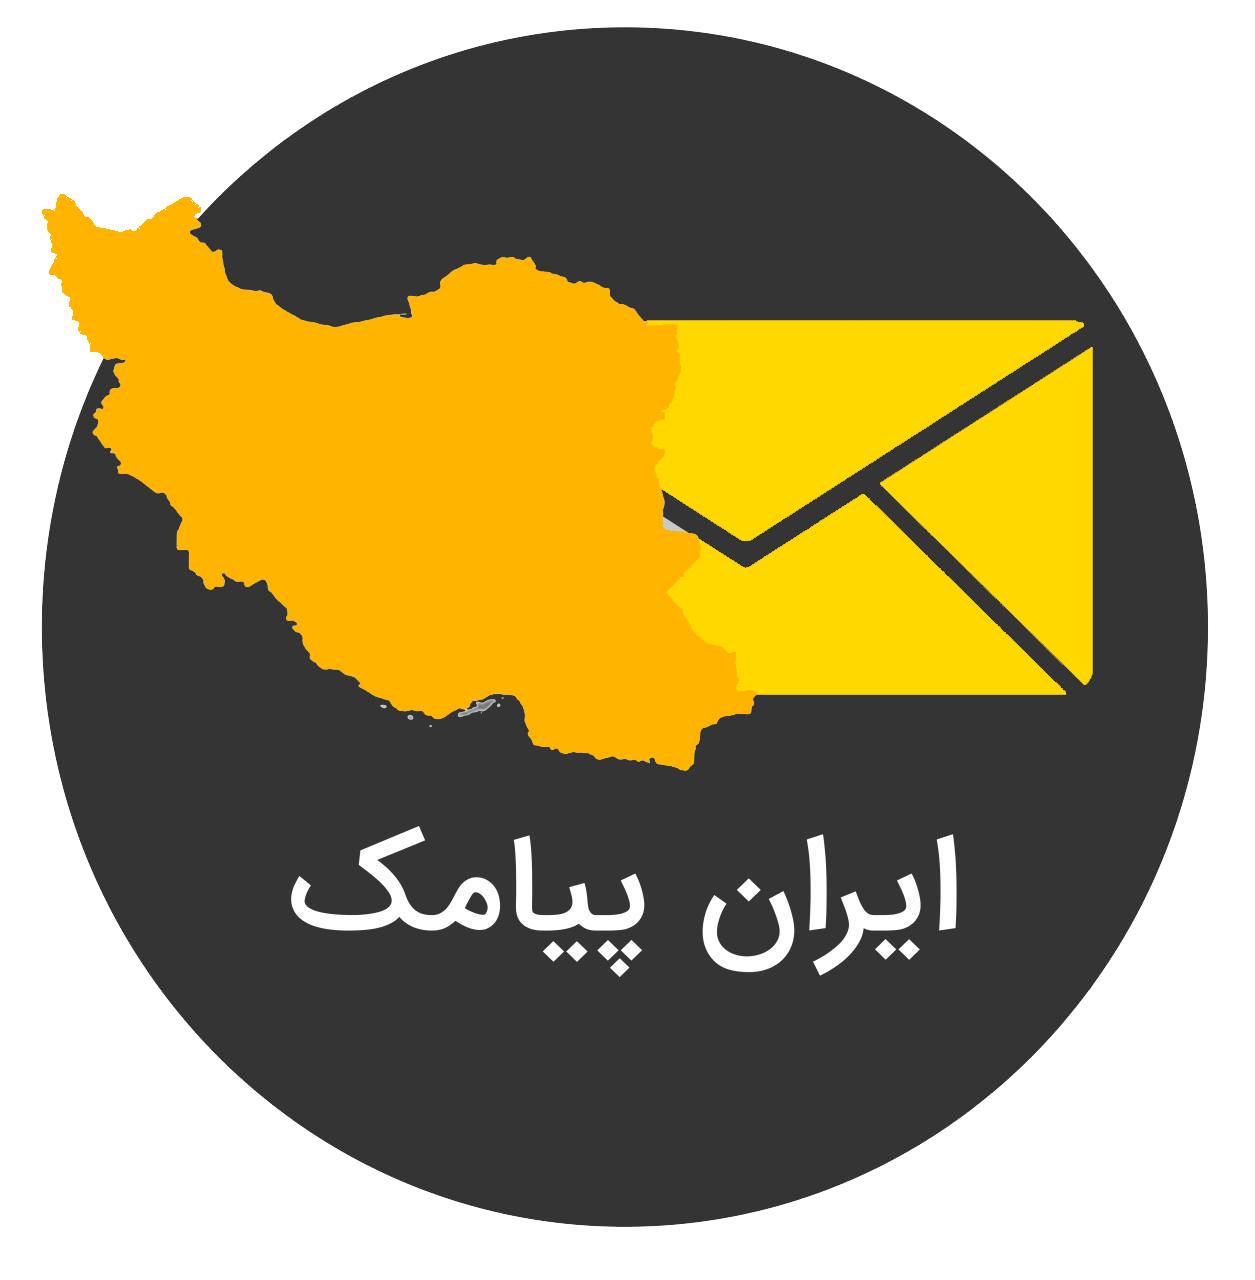 ایران پیامک